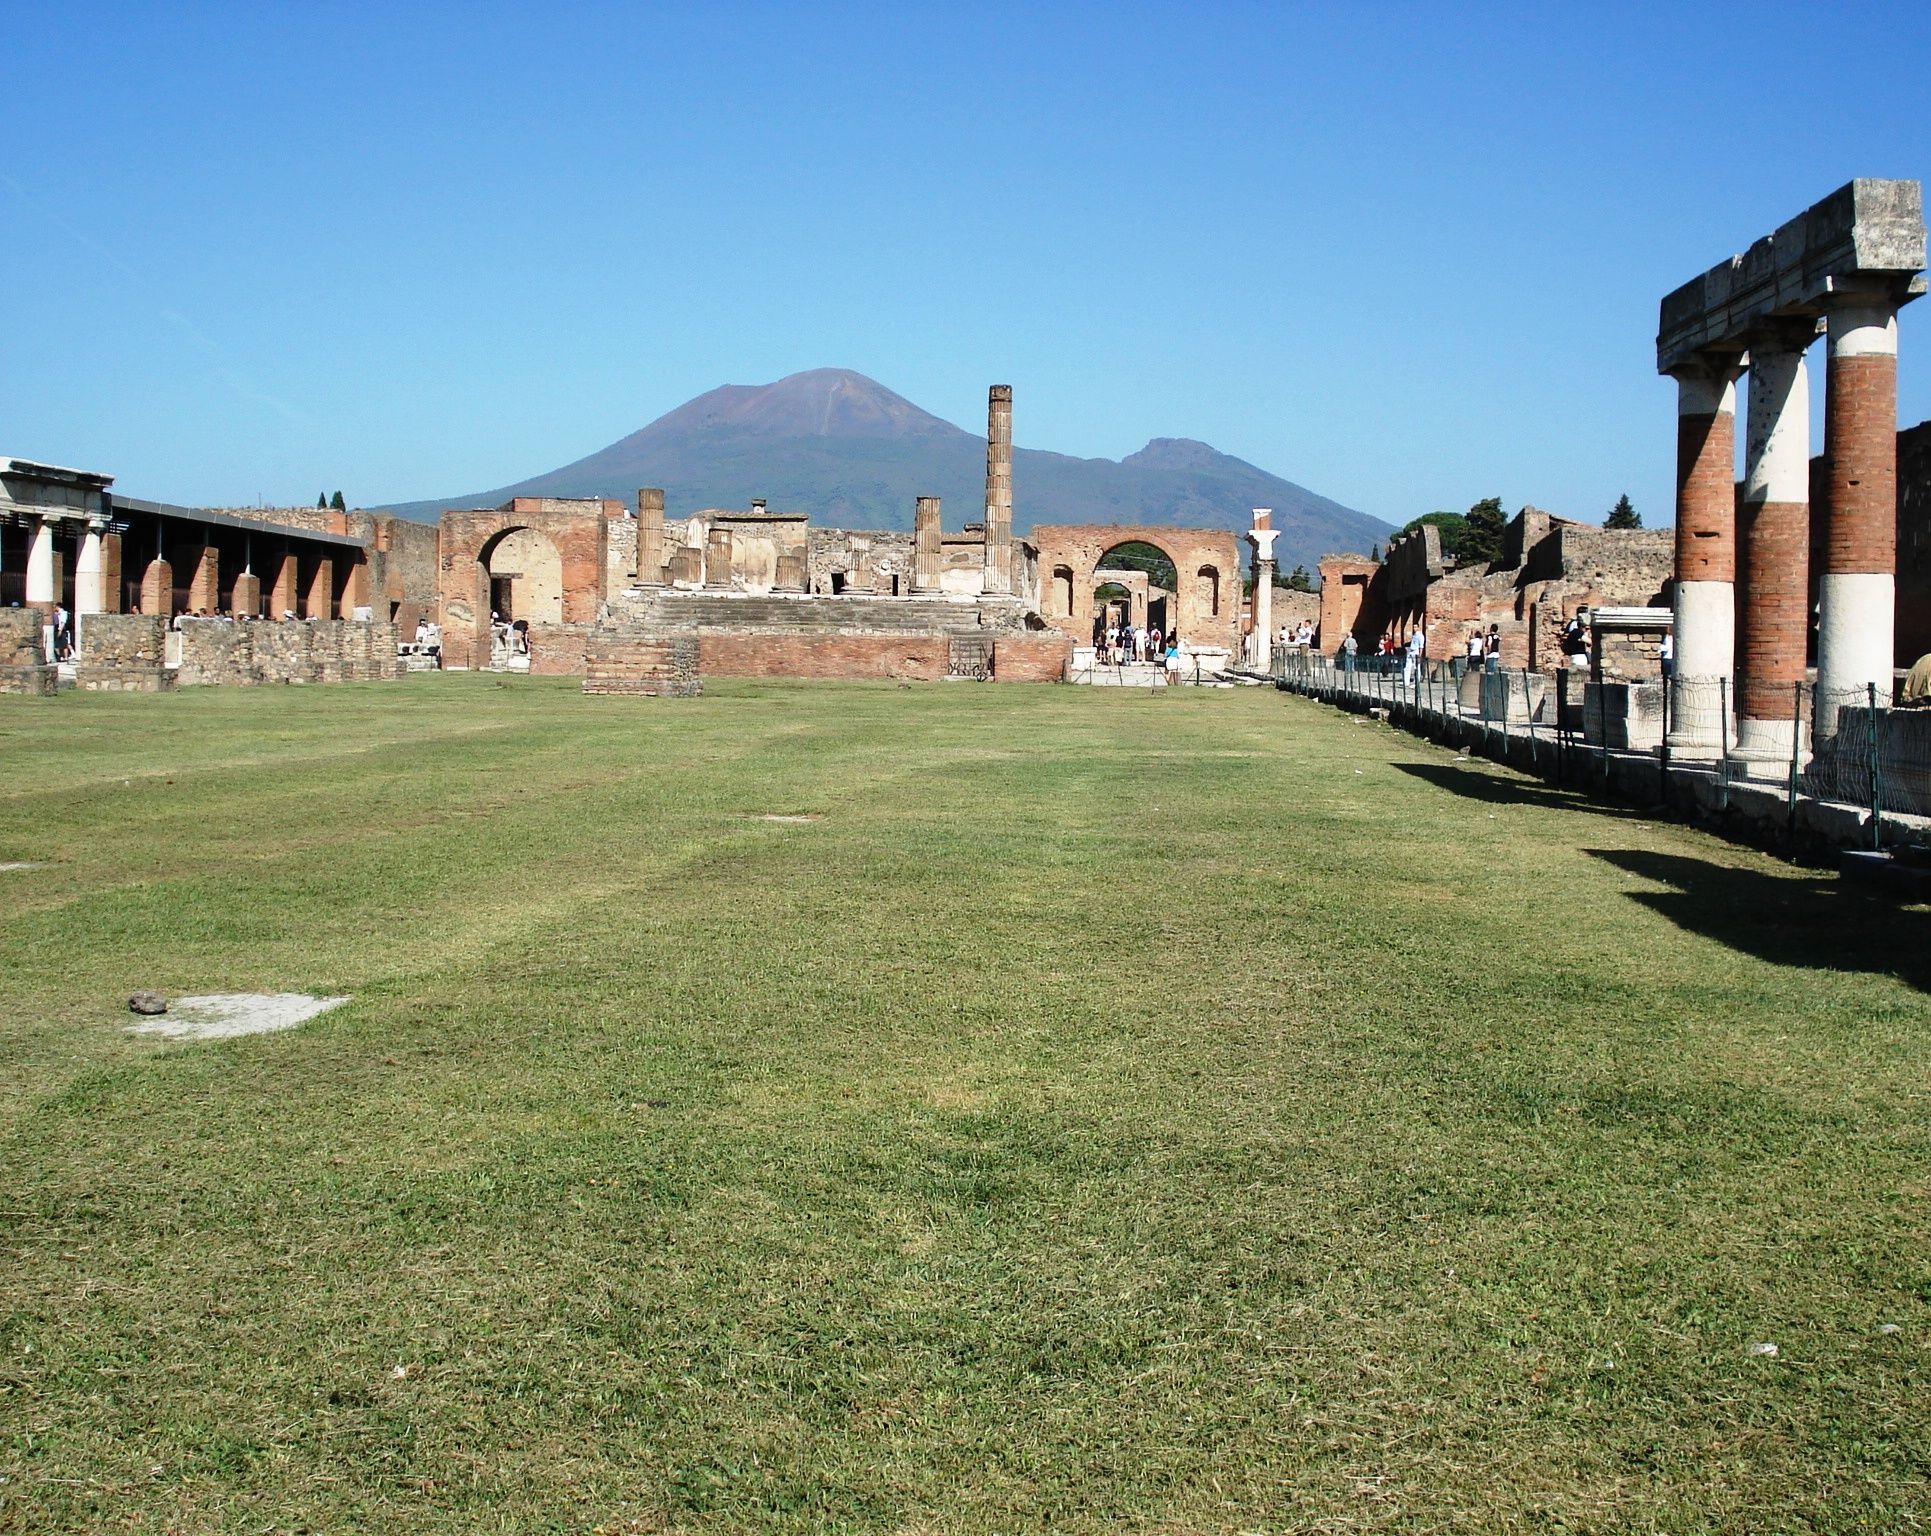 The Behemoth that destroyed Pompeii